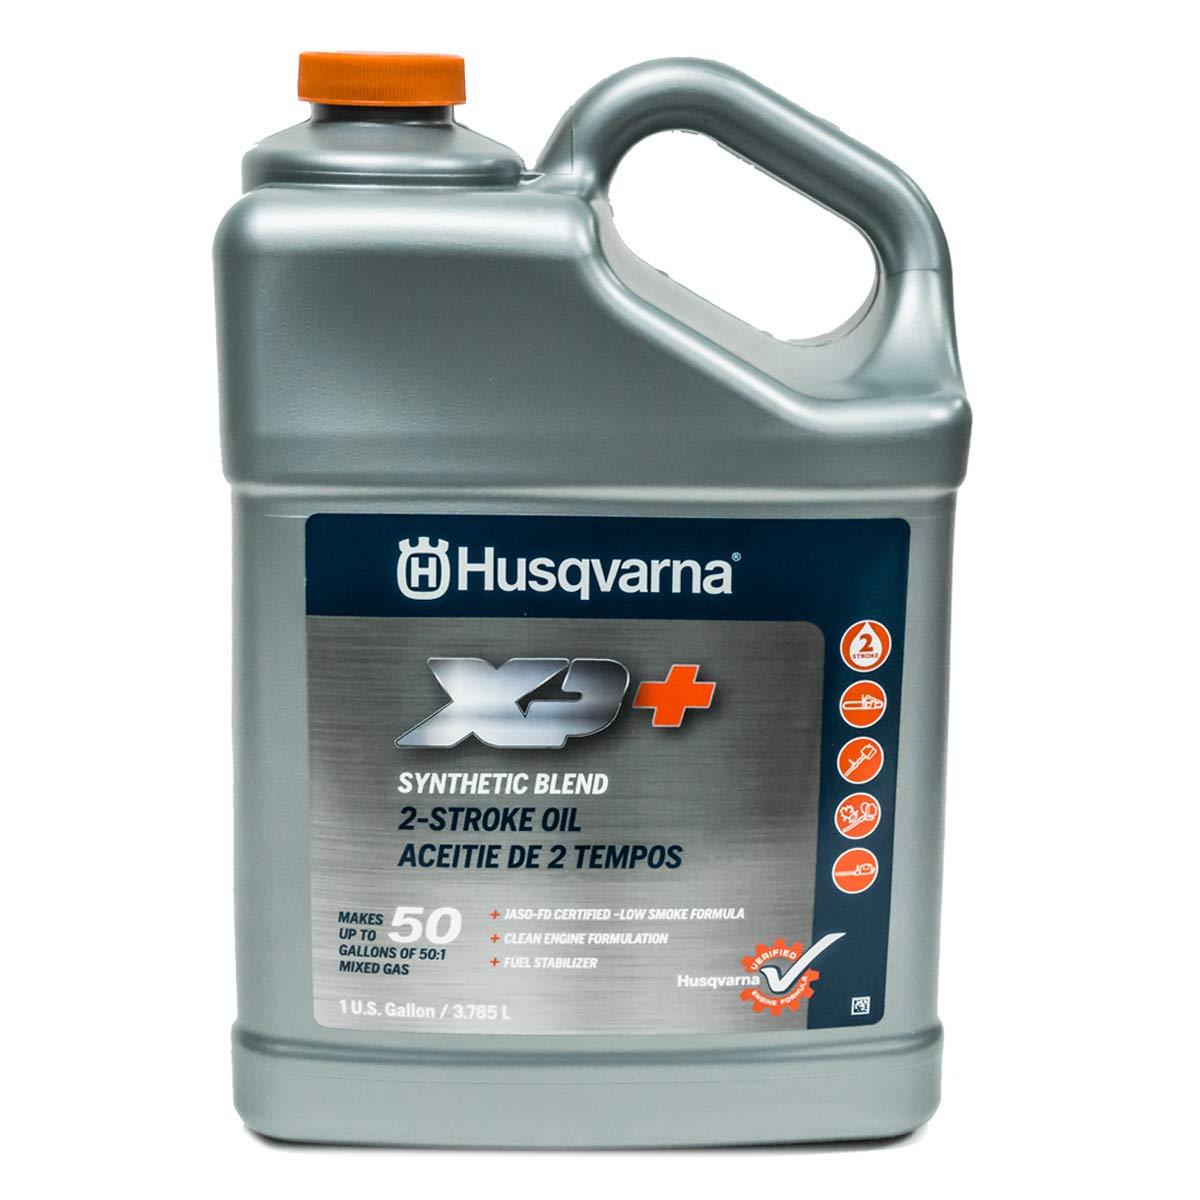 Husqvarna 593152305 XP+ 2 Stroke Engine Oil - 1 Gallon